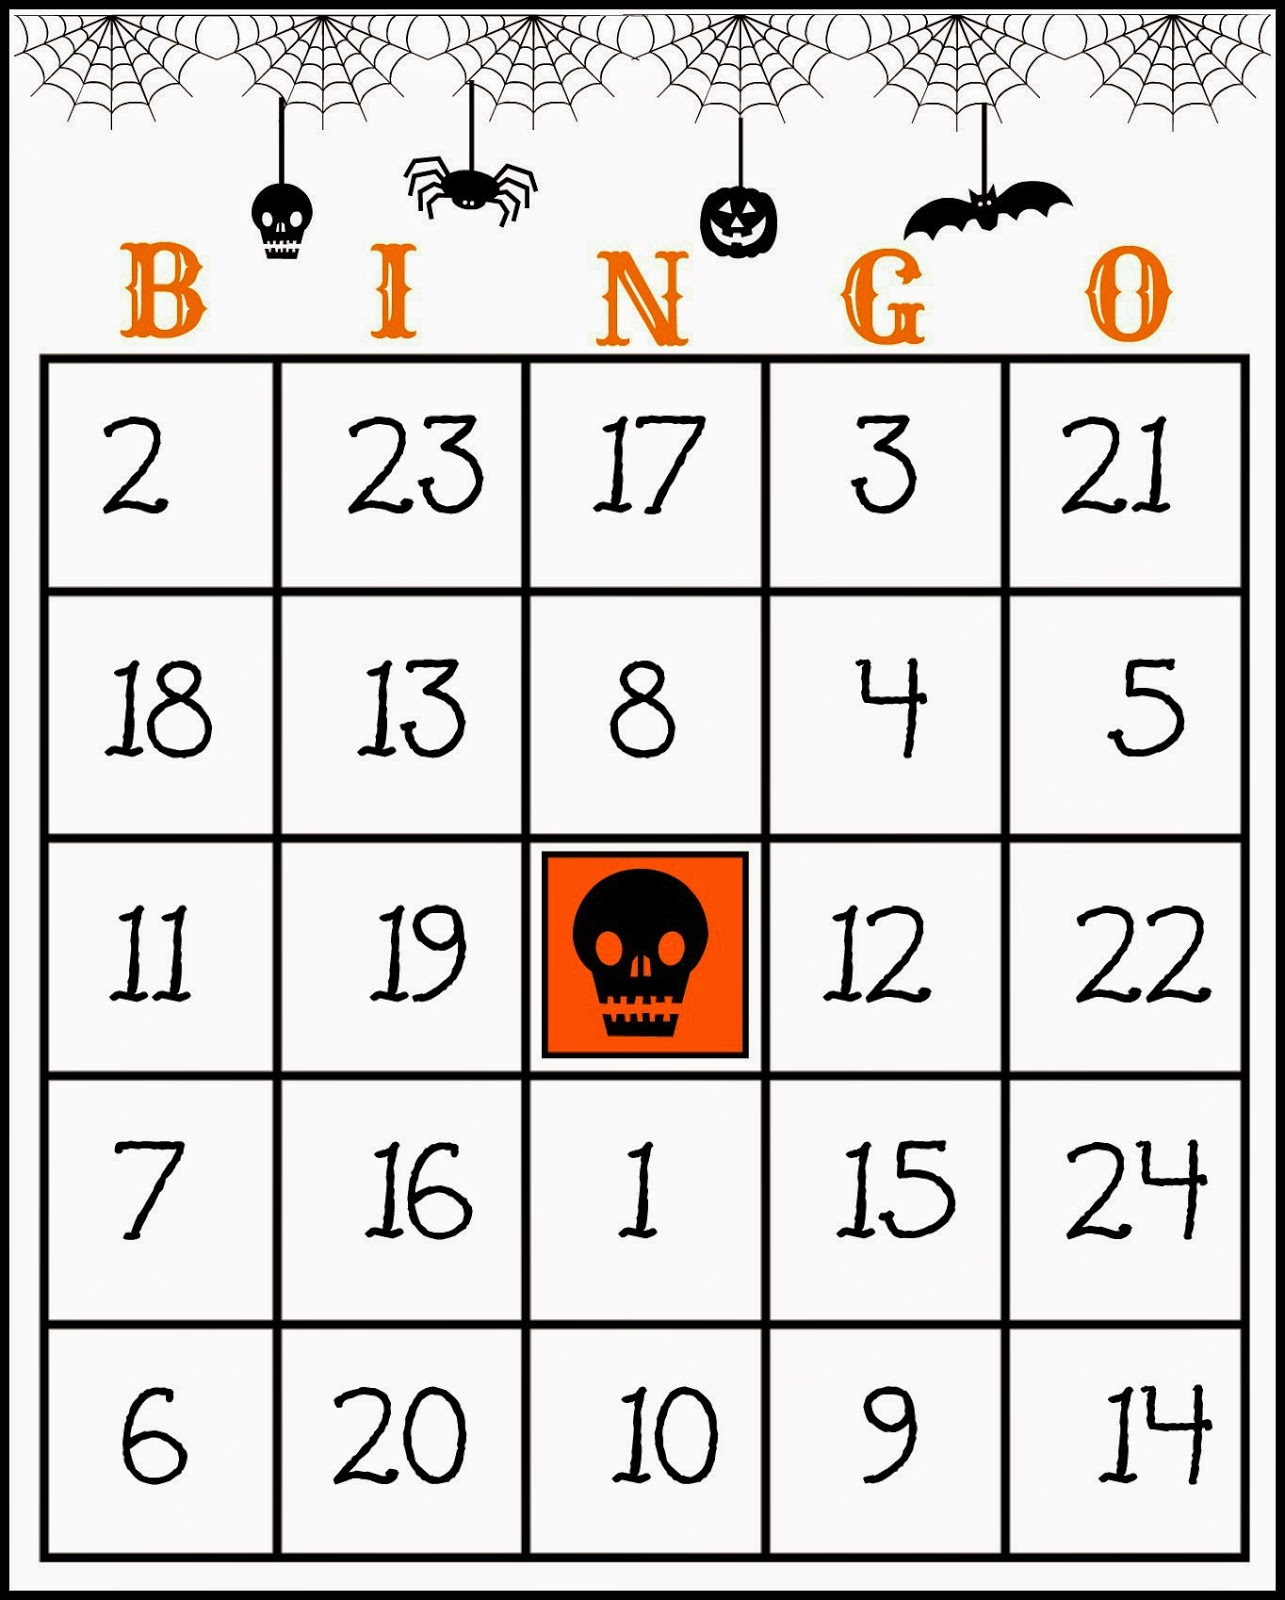 Crafty In Crosby: Free Printable Halloween Bingo Game - Free Printable Bingo Cards And Call Sheet